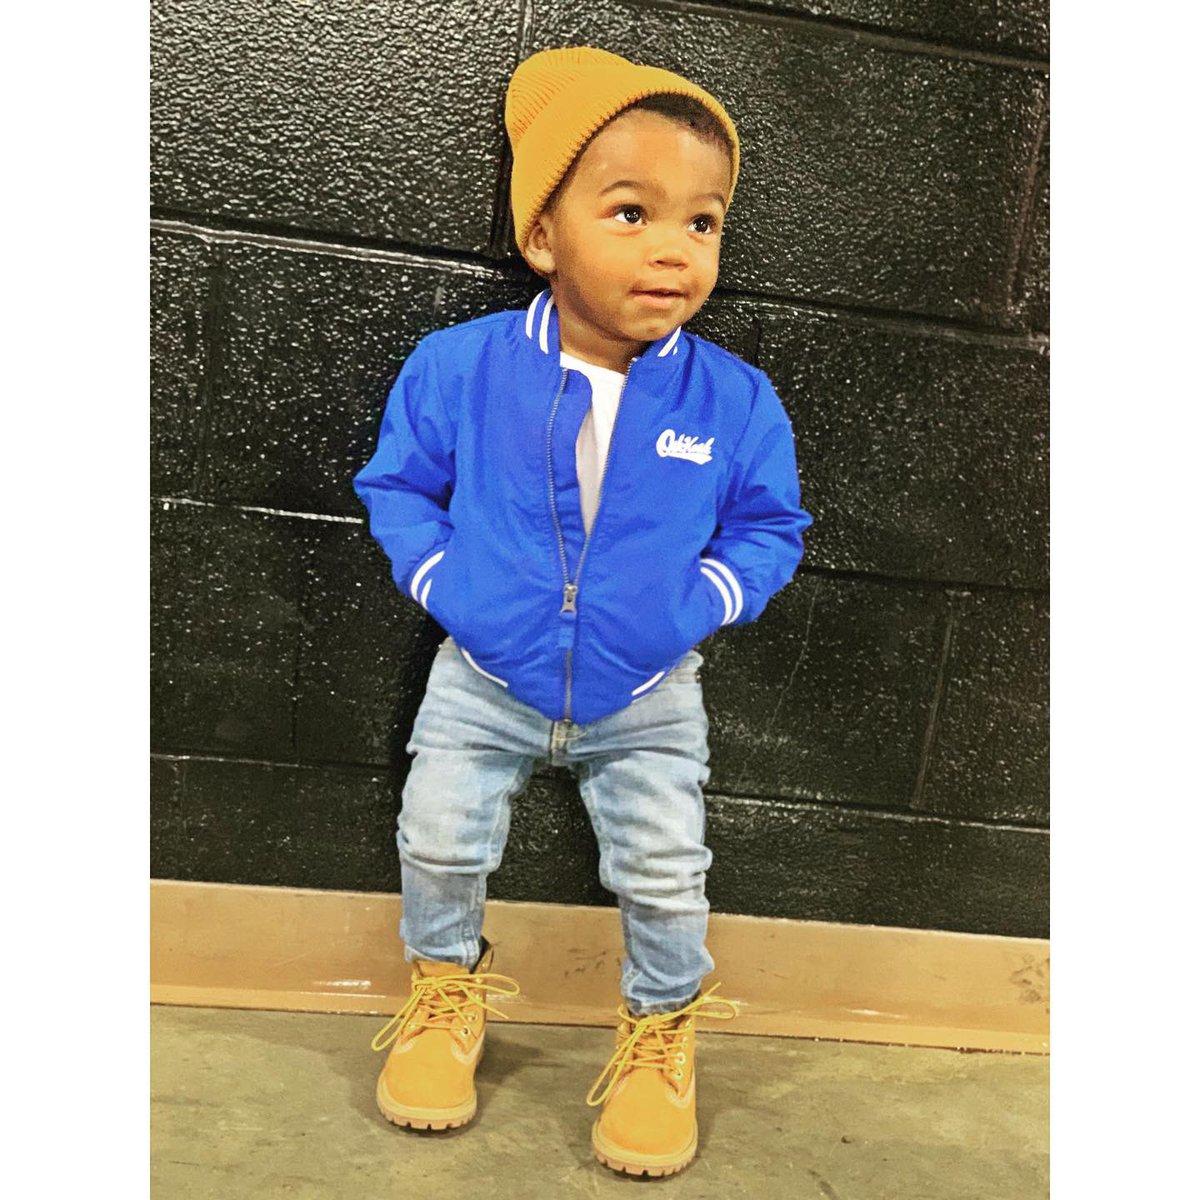 At this point @oshkoshkids, go ahead and endorse son son  #Handsome #SirLee #King #KidModel #ColumbusBabies #relevantFuture #sonsational #caters #oshkosh #bookHIMpic.twitter.com/Ro7ZBu32Sz